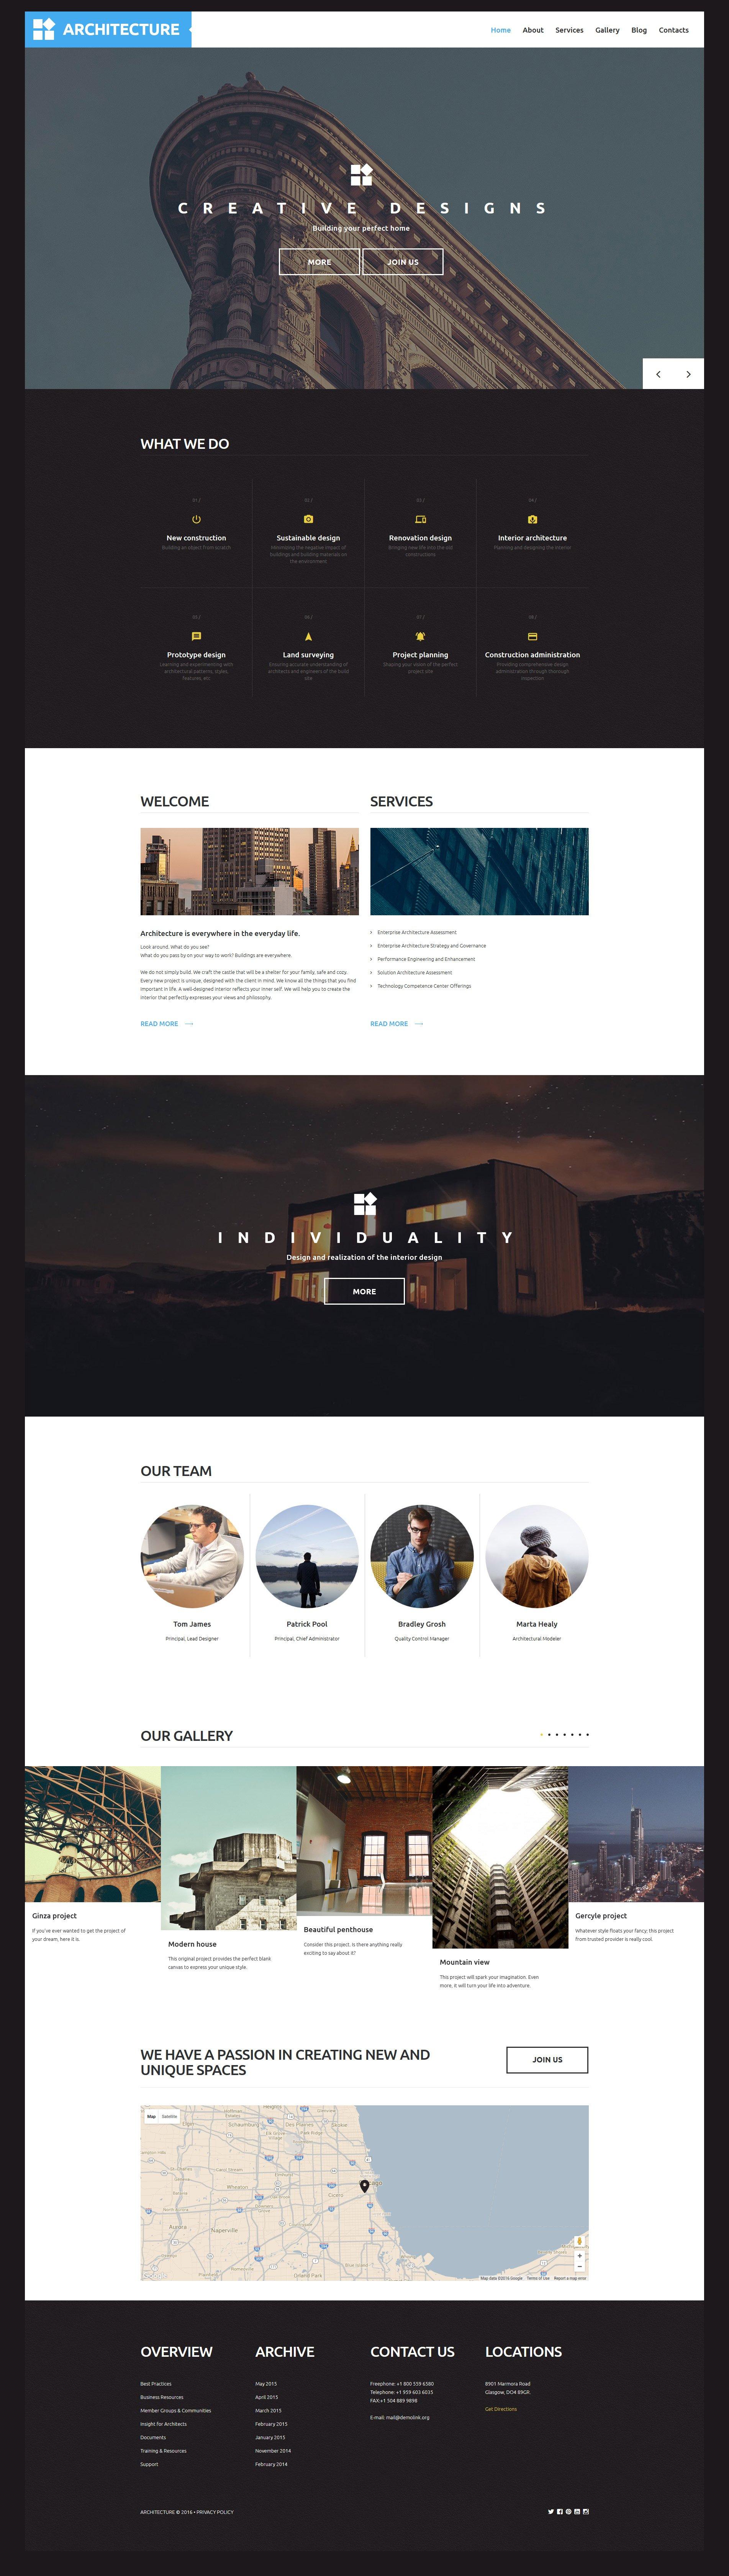 Architecture WordPress Theme - screenshot